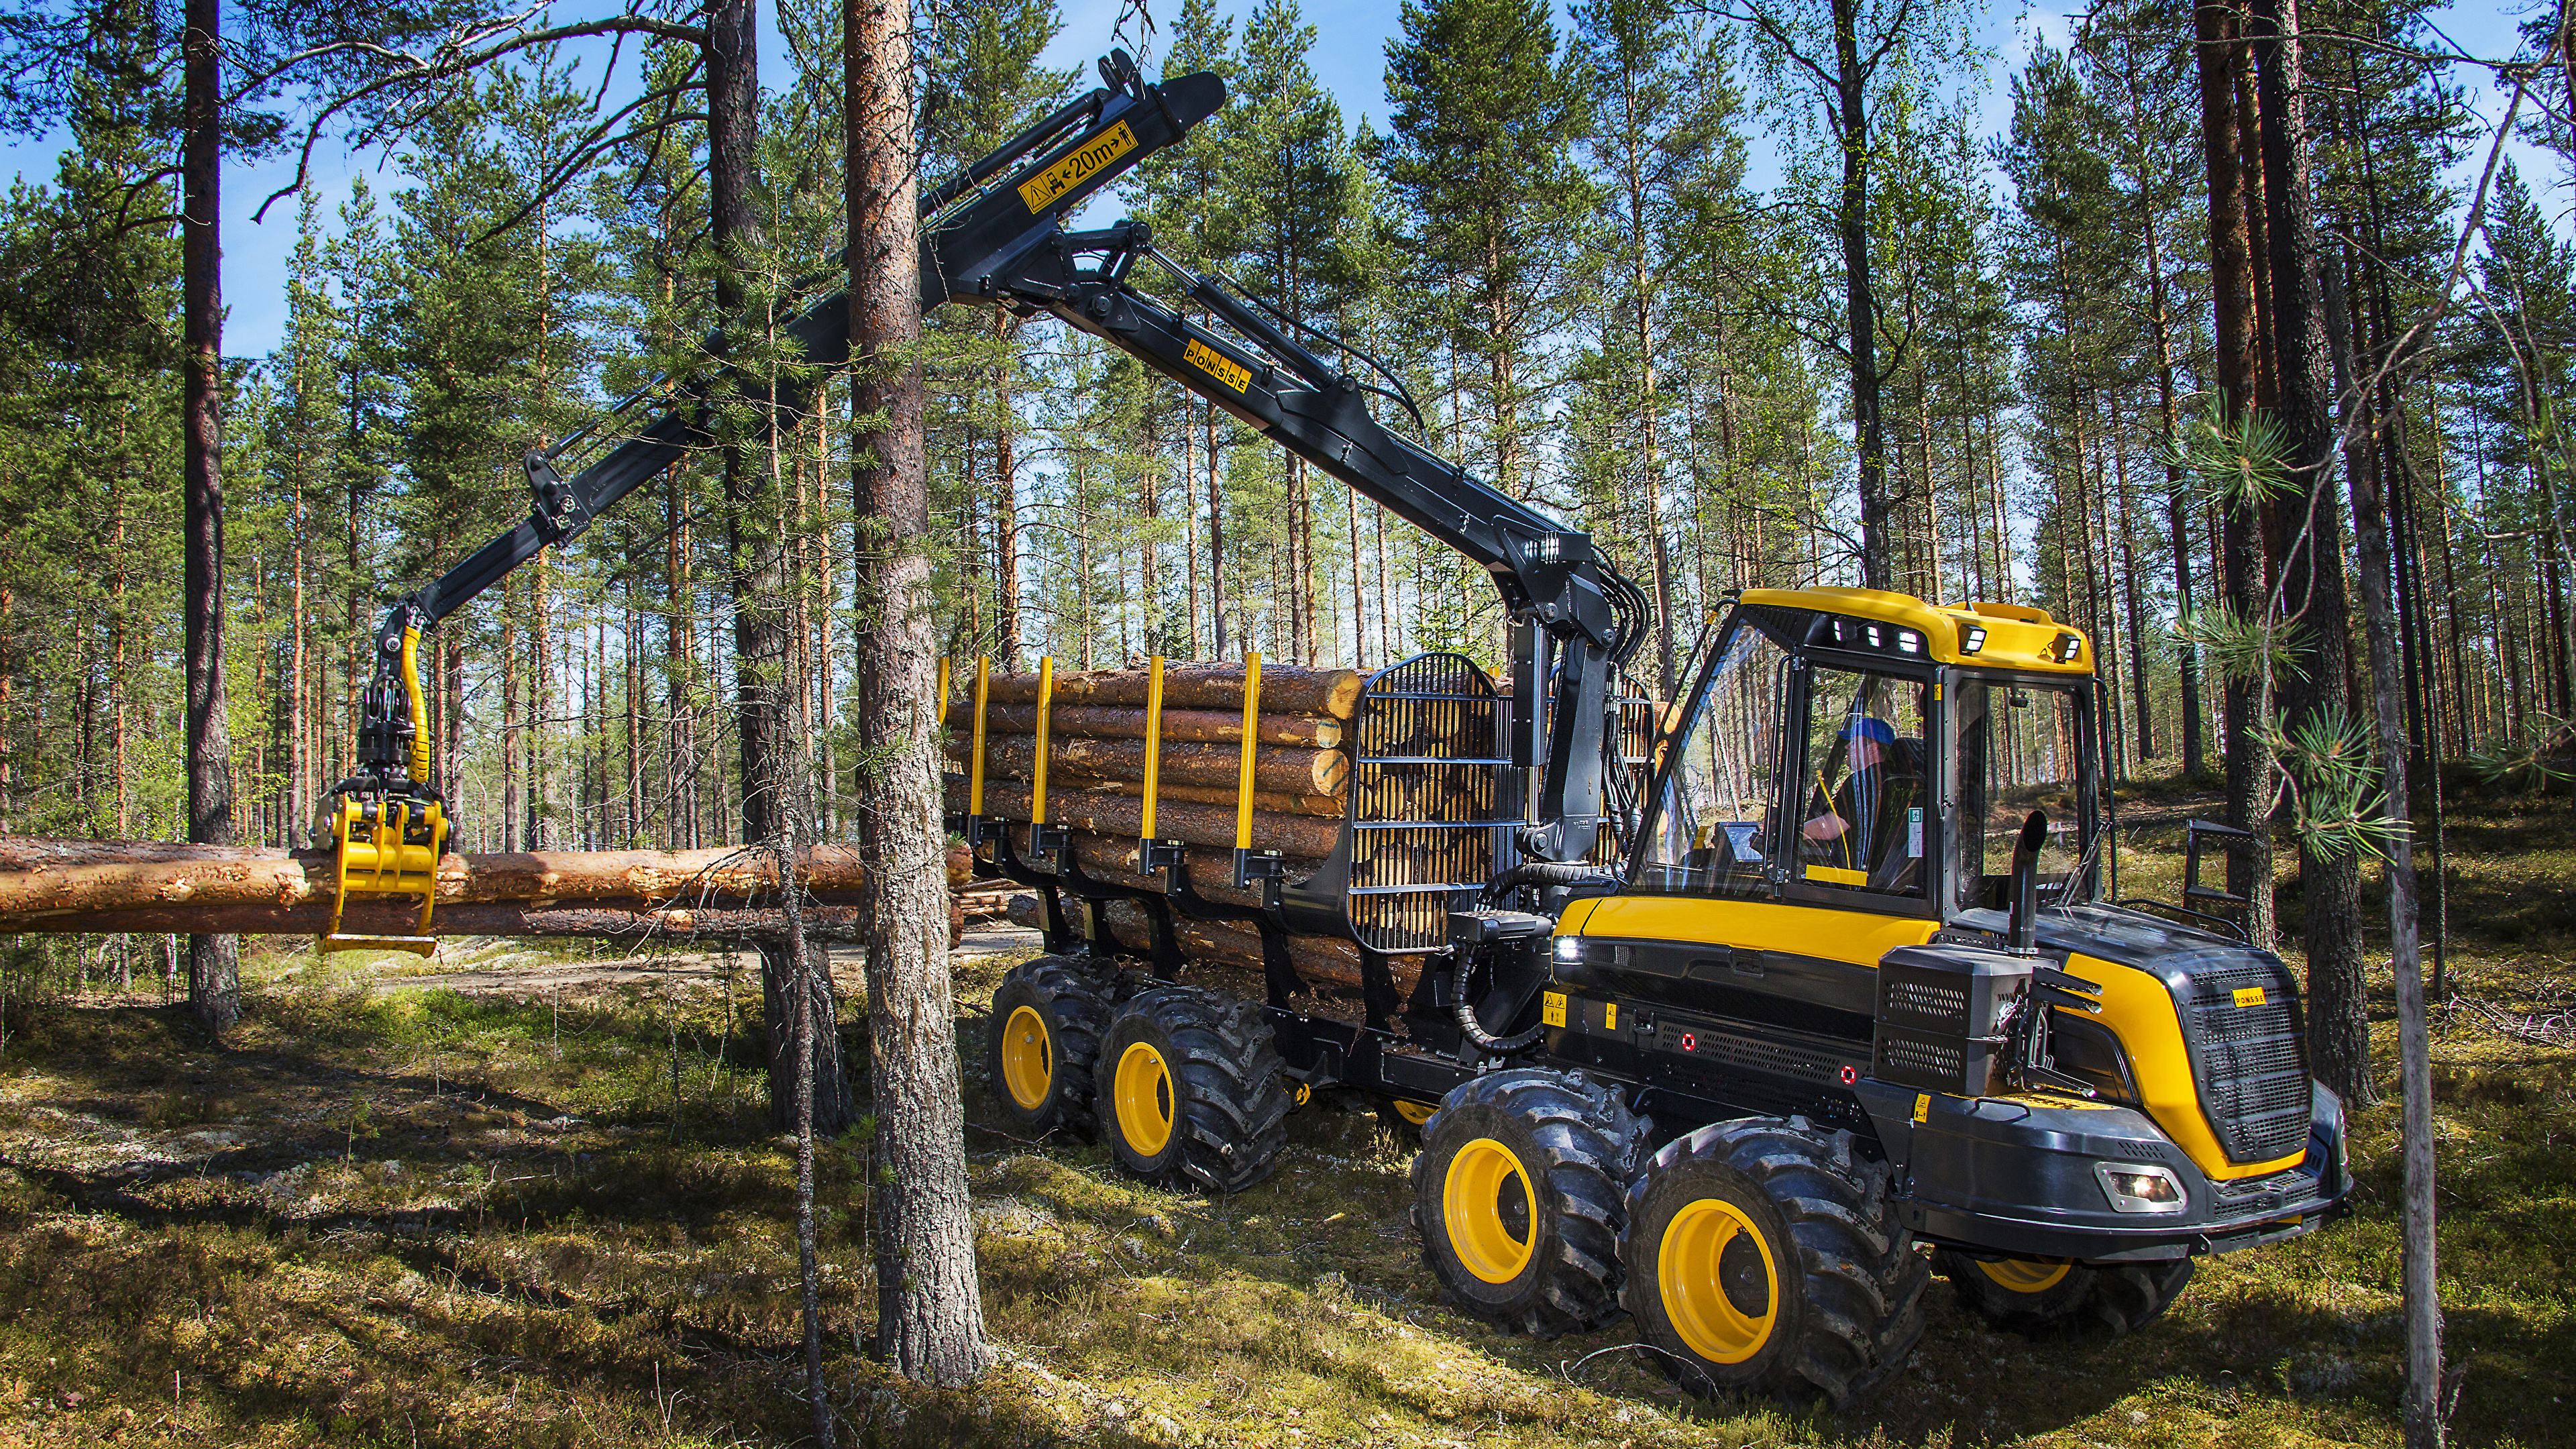 Фотографии Форвардер 2014-17 Ponsse Wisent 8w бревно лес 3840x2160 Бревна Леса